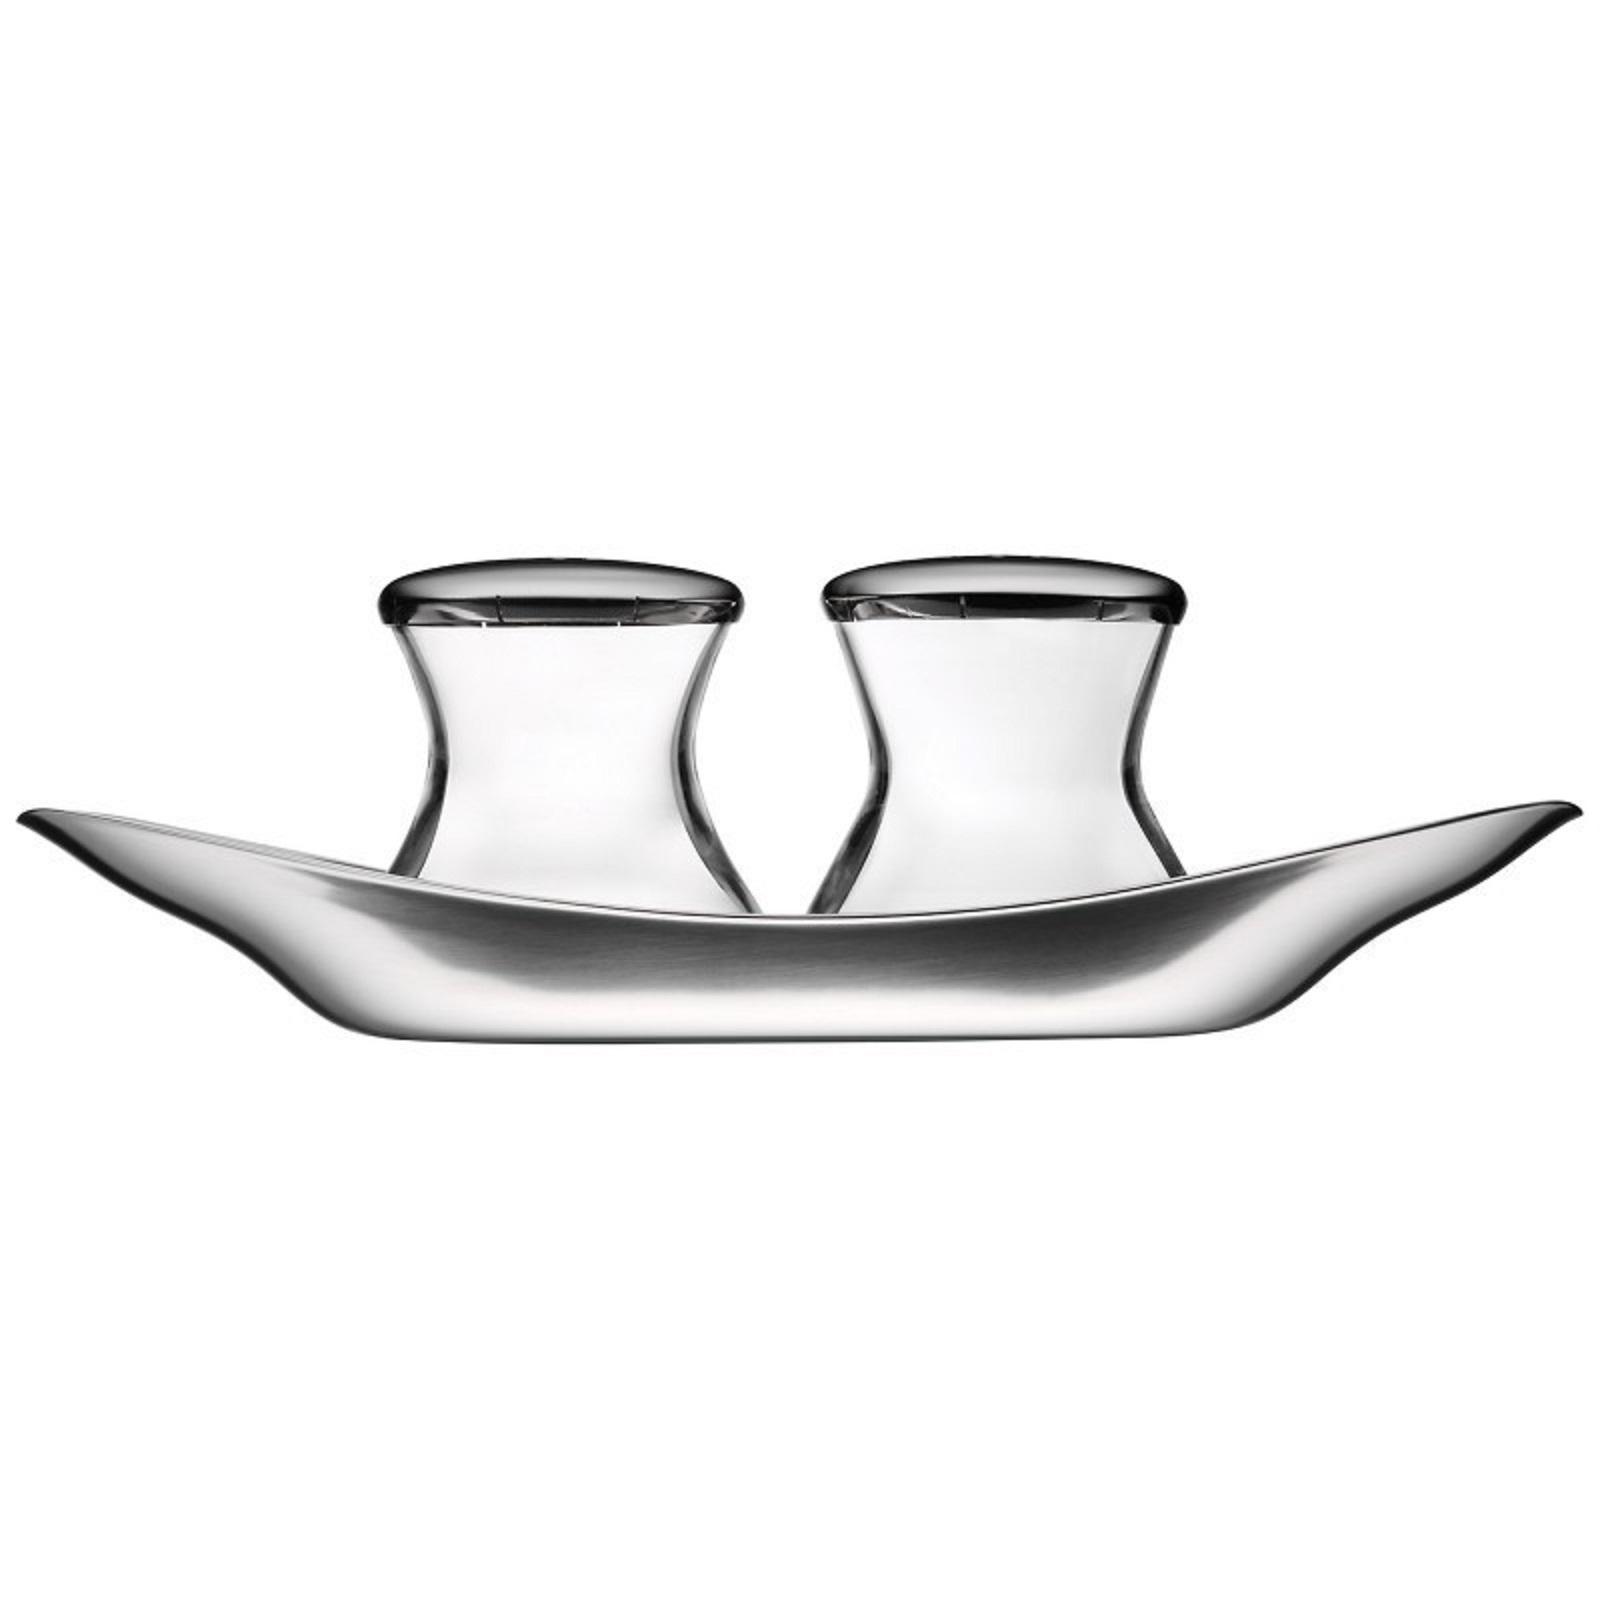 Онлайн каталог PROMENU: Набор для специй WMF Wagenfeld, серебристый, 3 предмета WMF 06 6007 9990